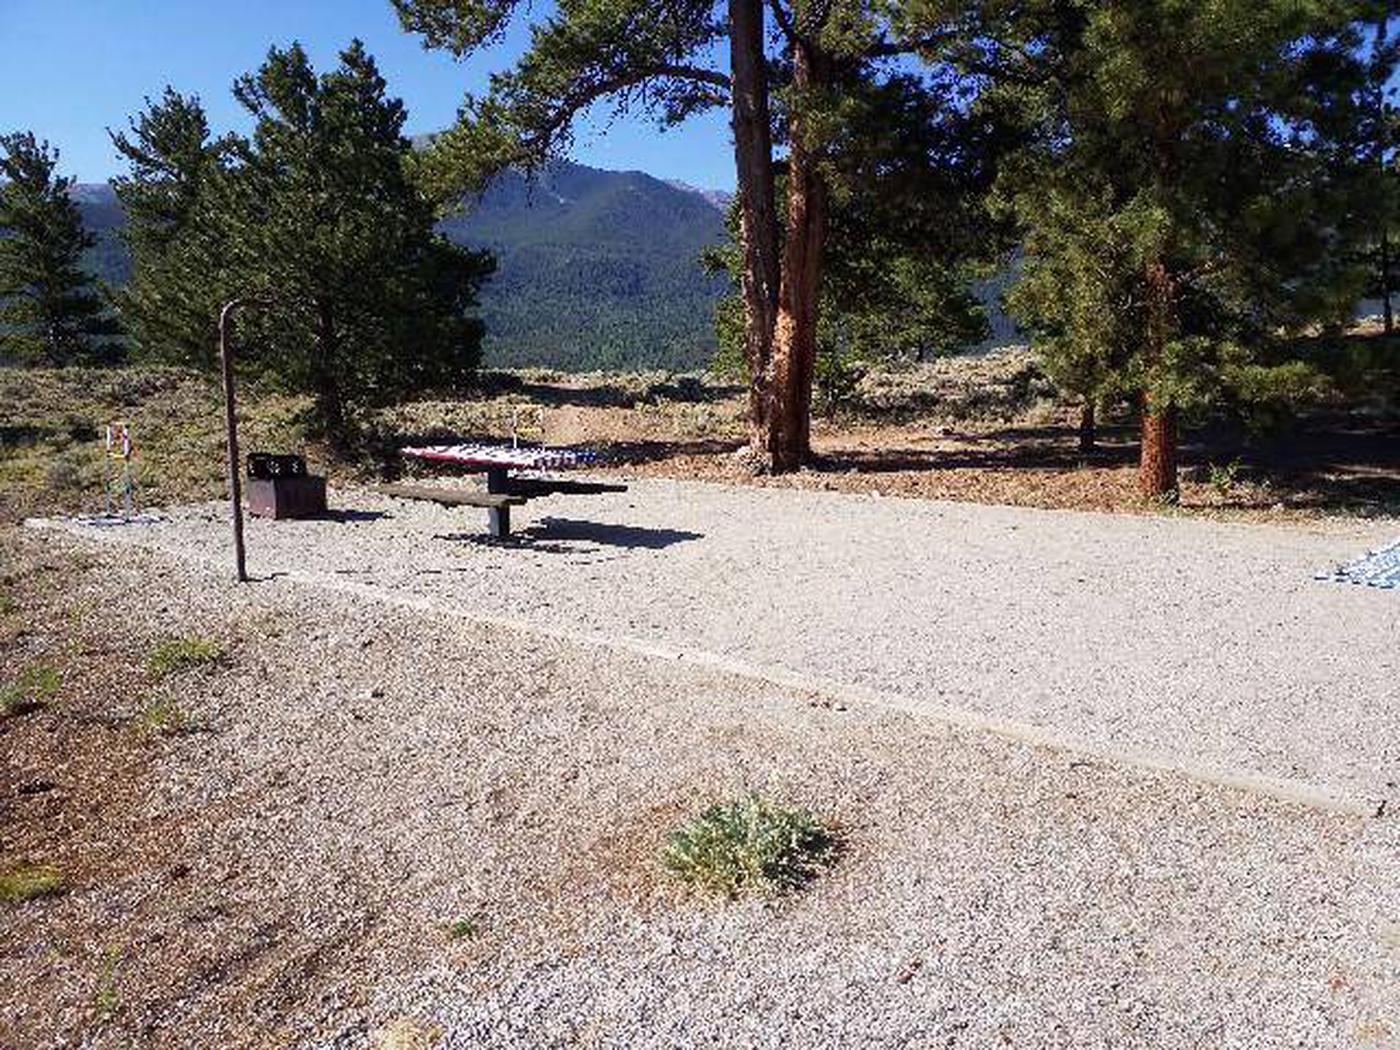 White Star Campground, site 7